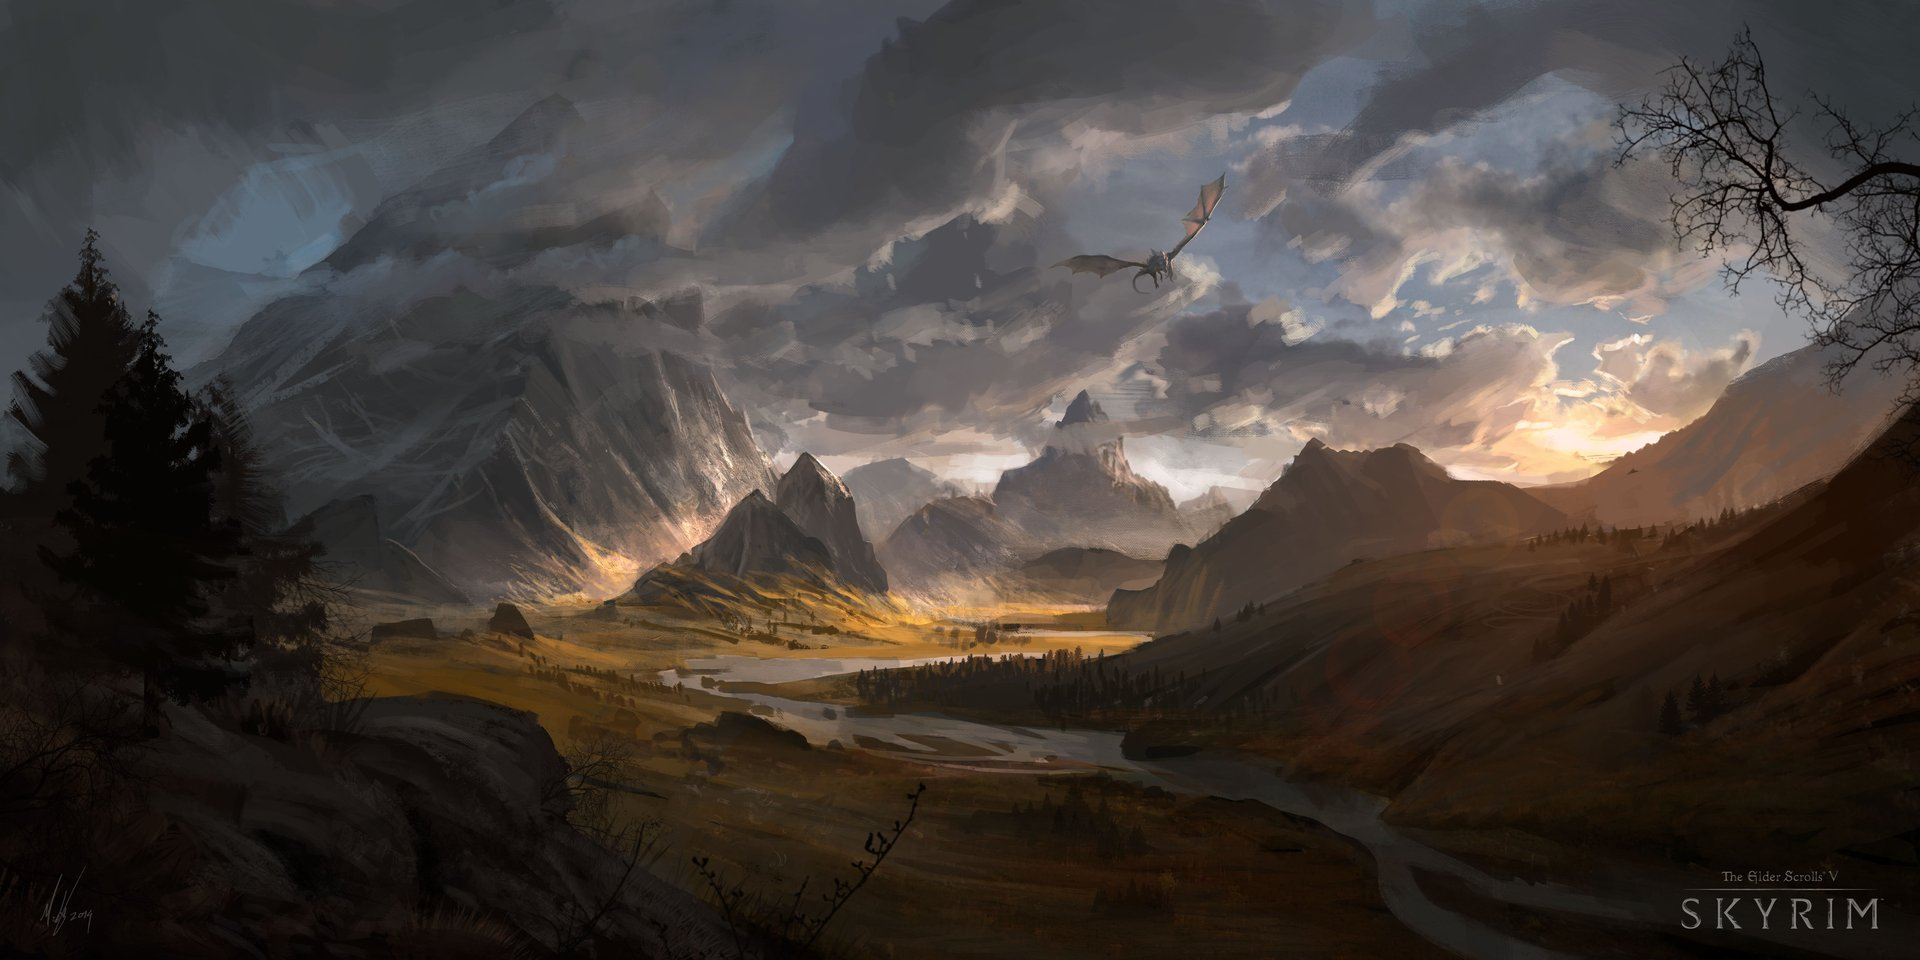 ArtStation - Skyrim - Whiterun Hold, Michal Kus